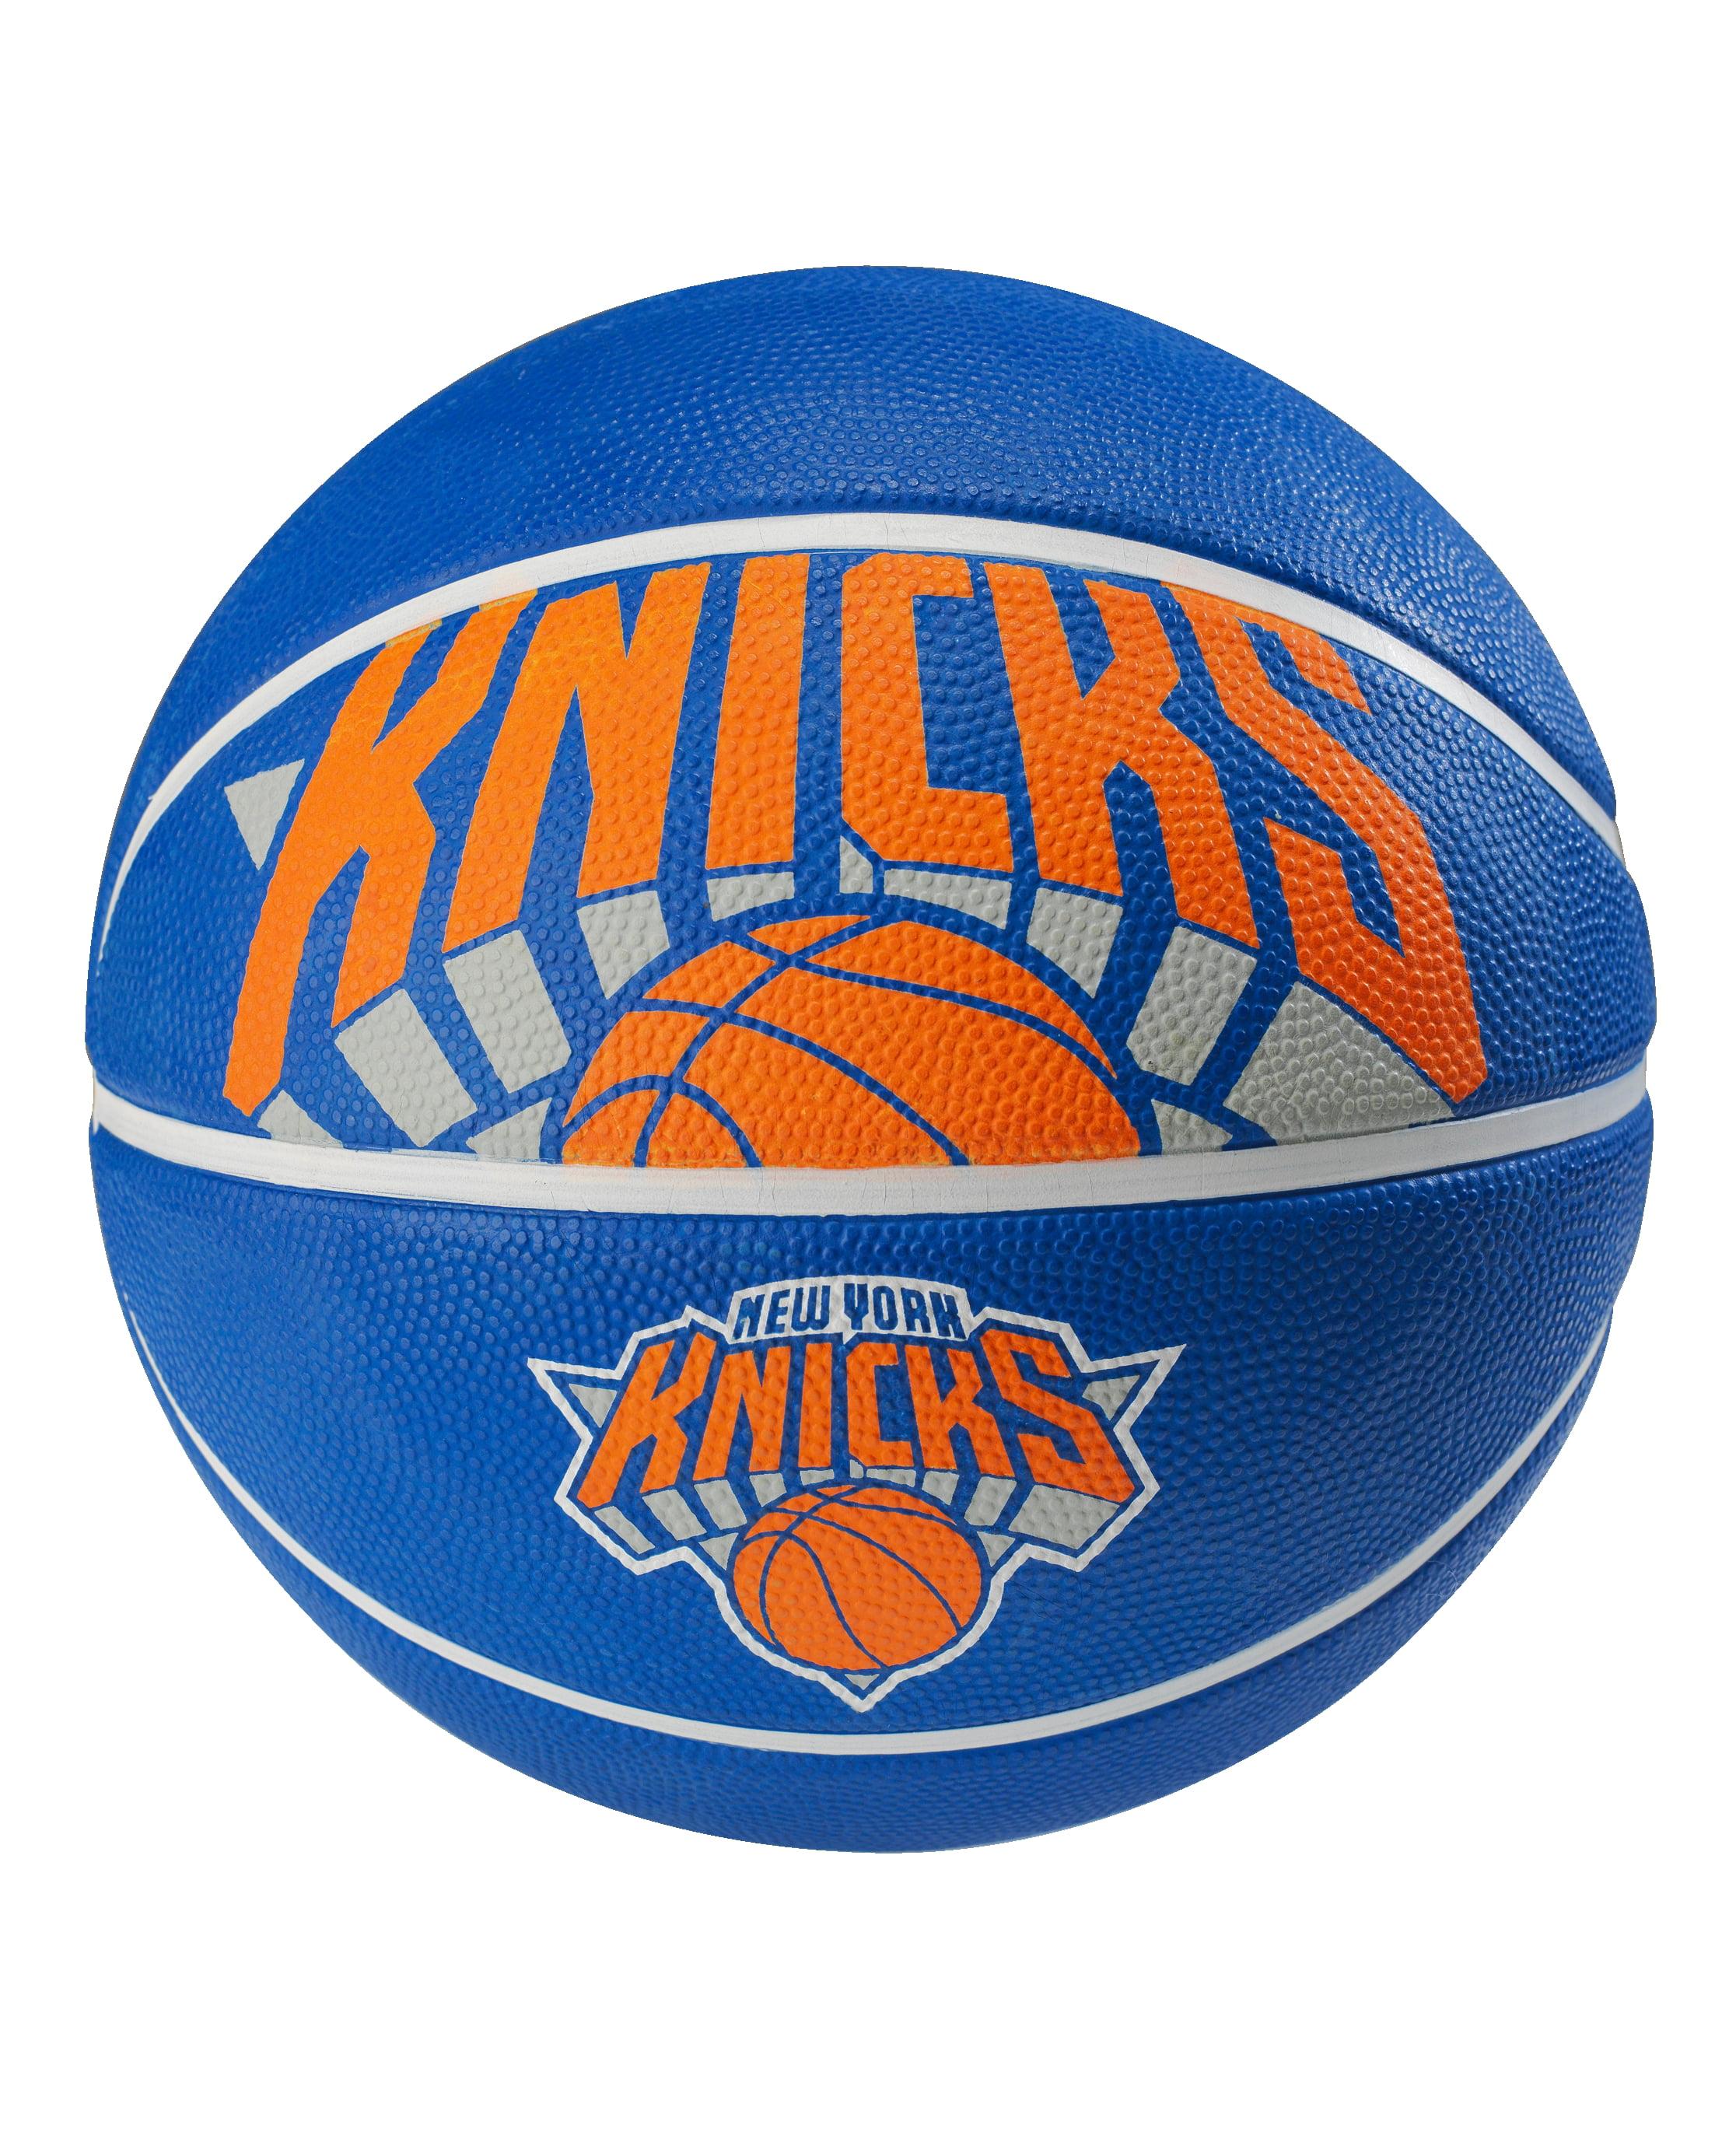 Spalding NBA New York Knicks Team Logo - Walmart.com